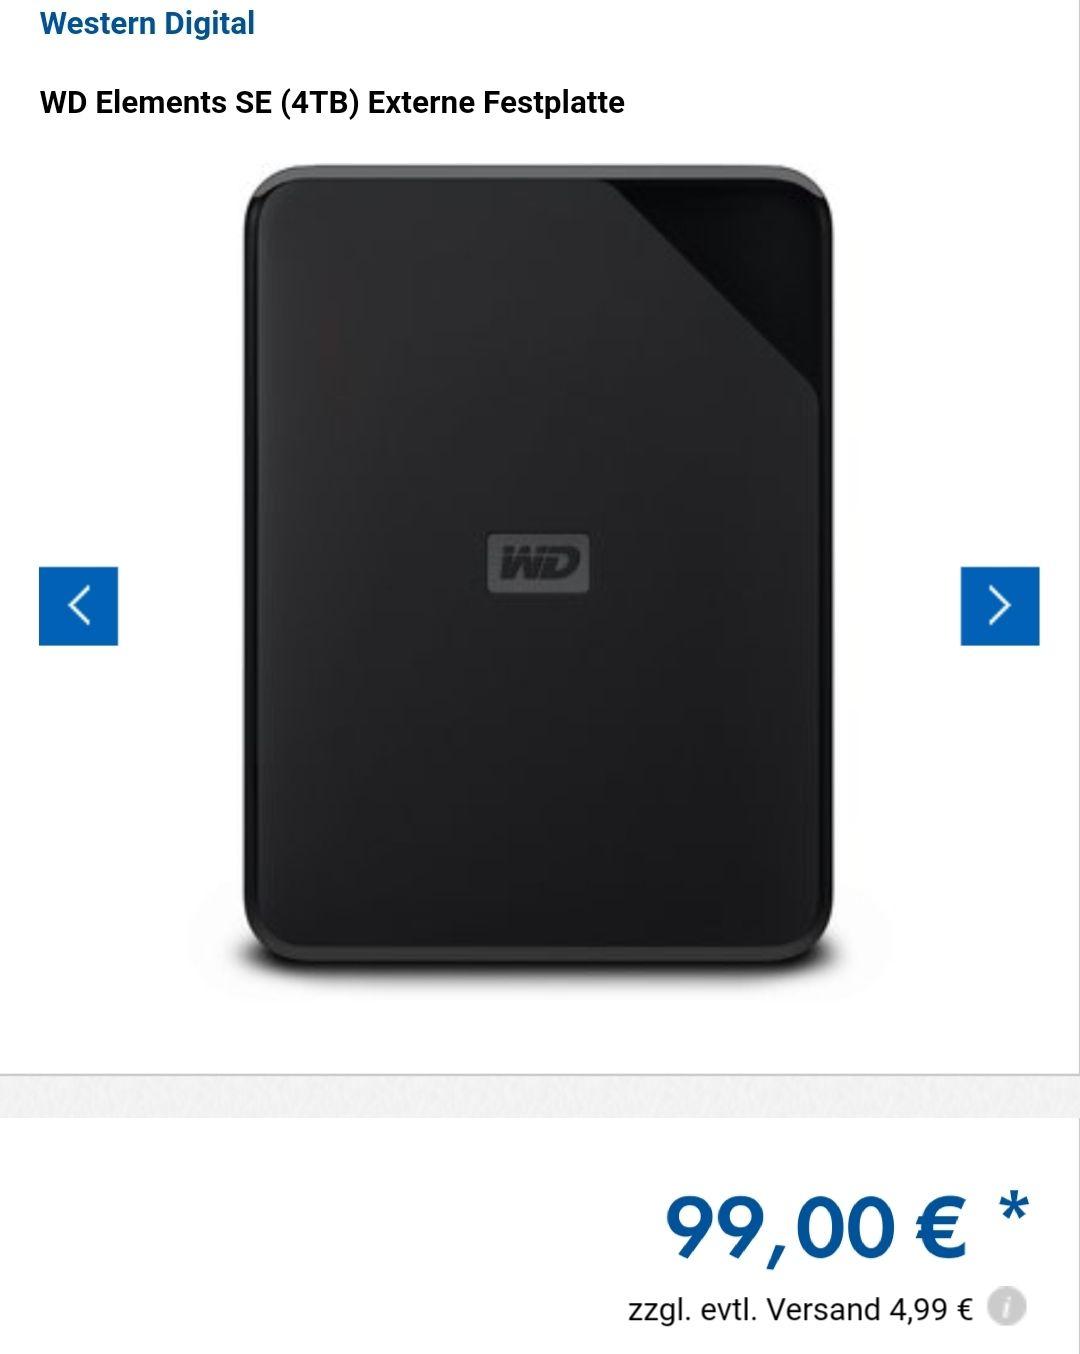 [Euronics XXL] WD Elements SE 4TB externe Festplatte 2,5 Zoll